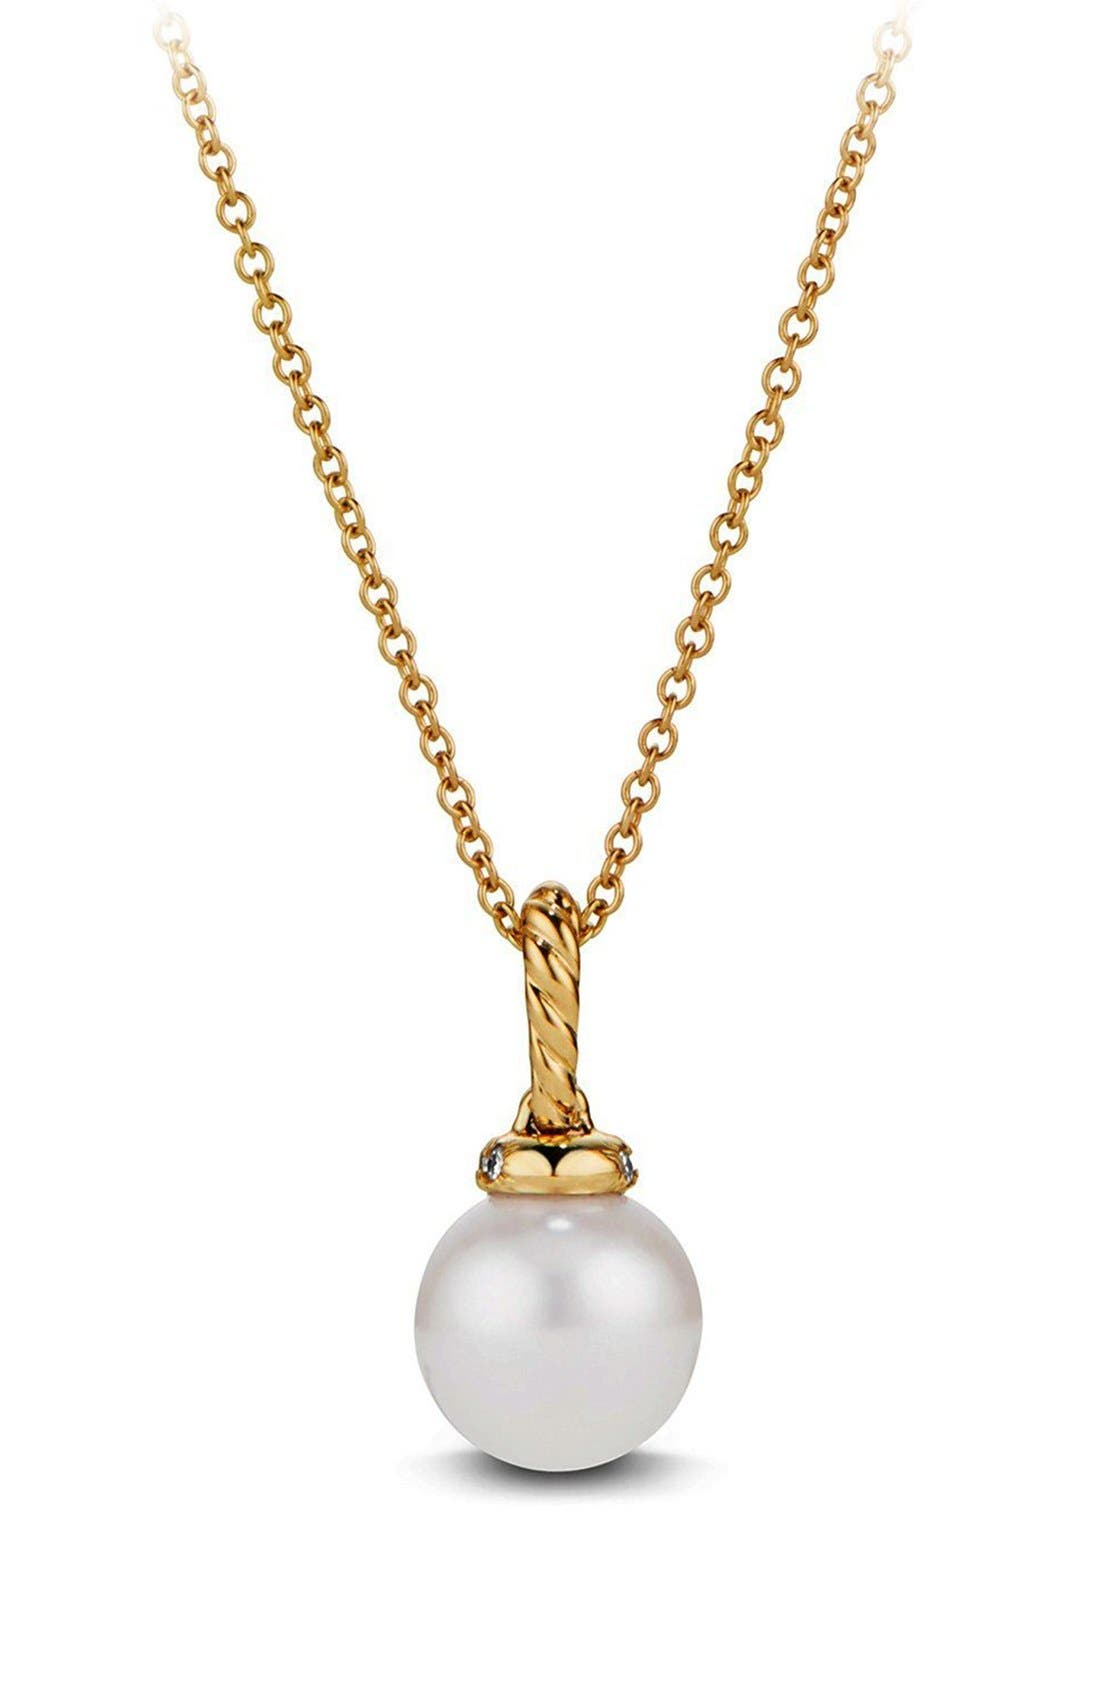 Alternate Image 3  - David Yurman 'Solari' Pendant Necklace with Pearls and Diamonds in 18K Gold